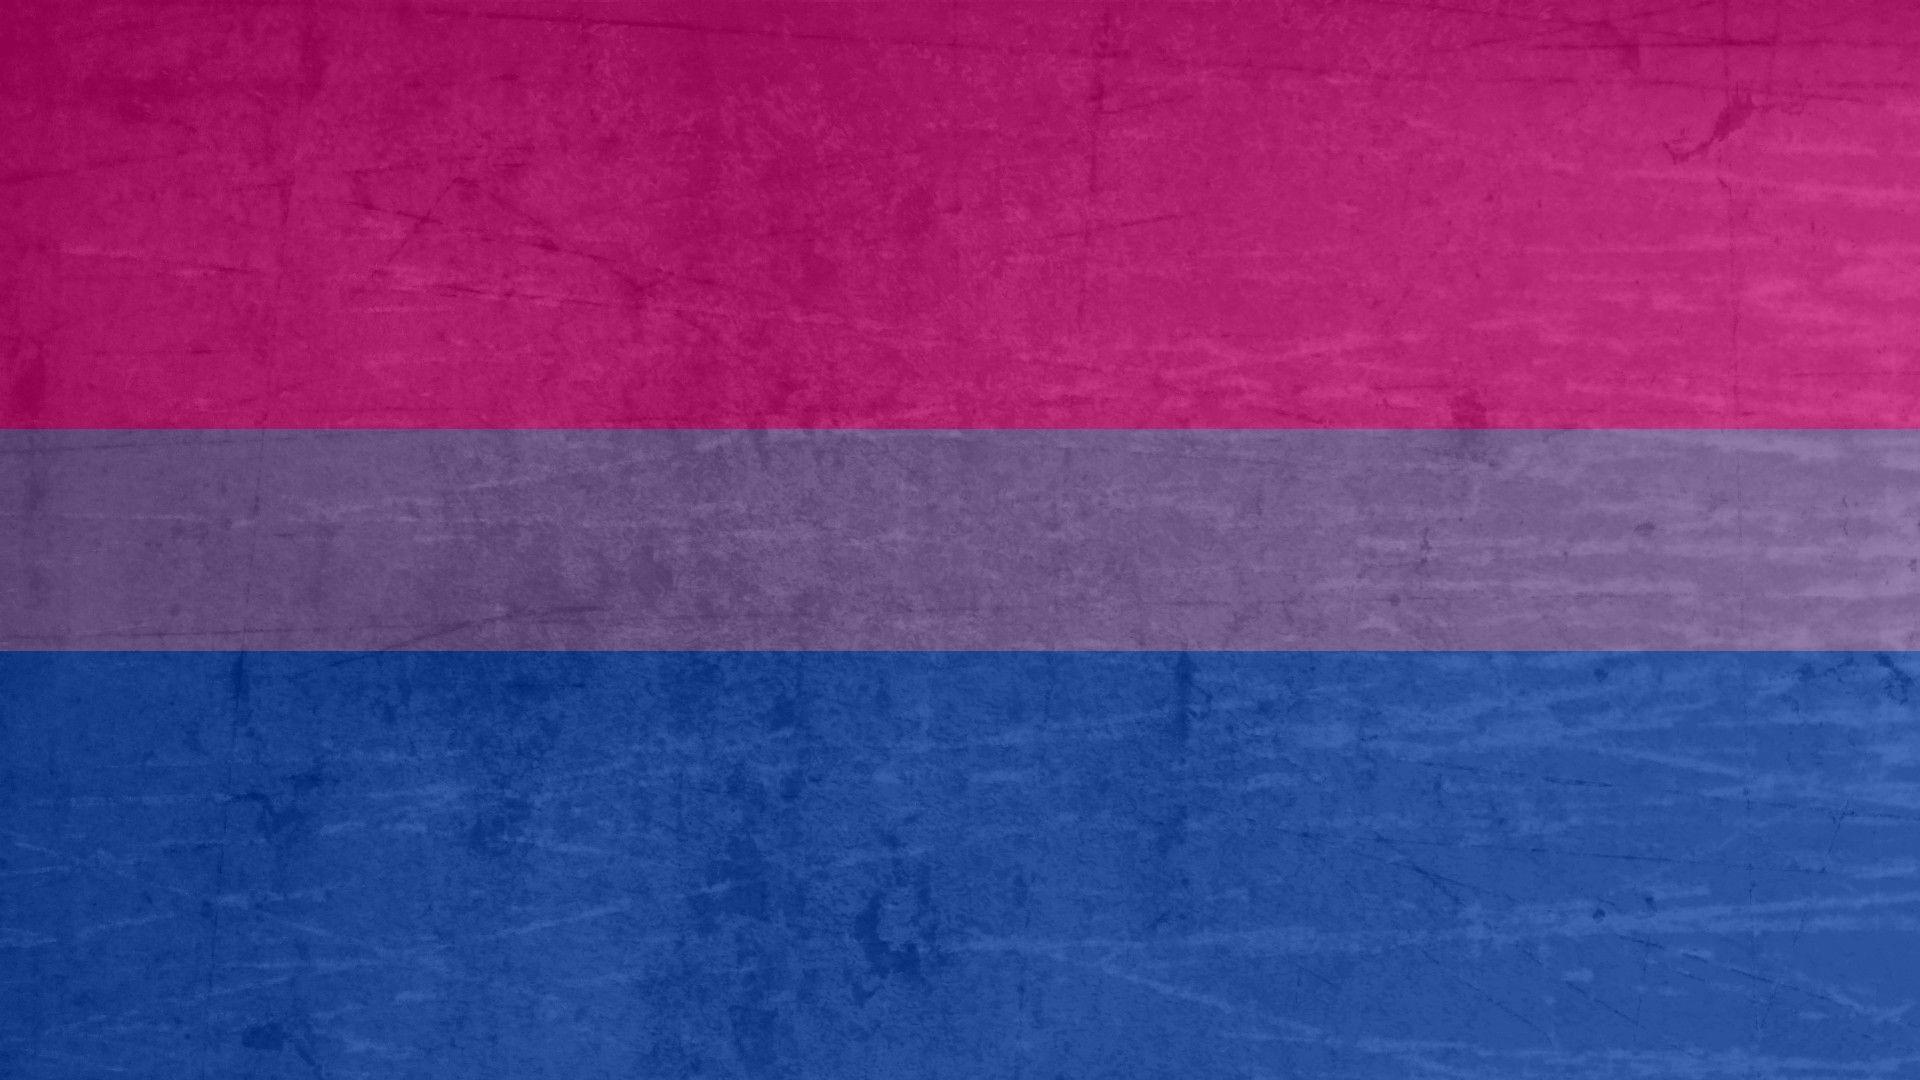 Bisexual Wallpapers Wallpaper Cave